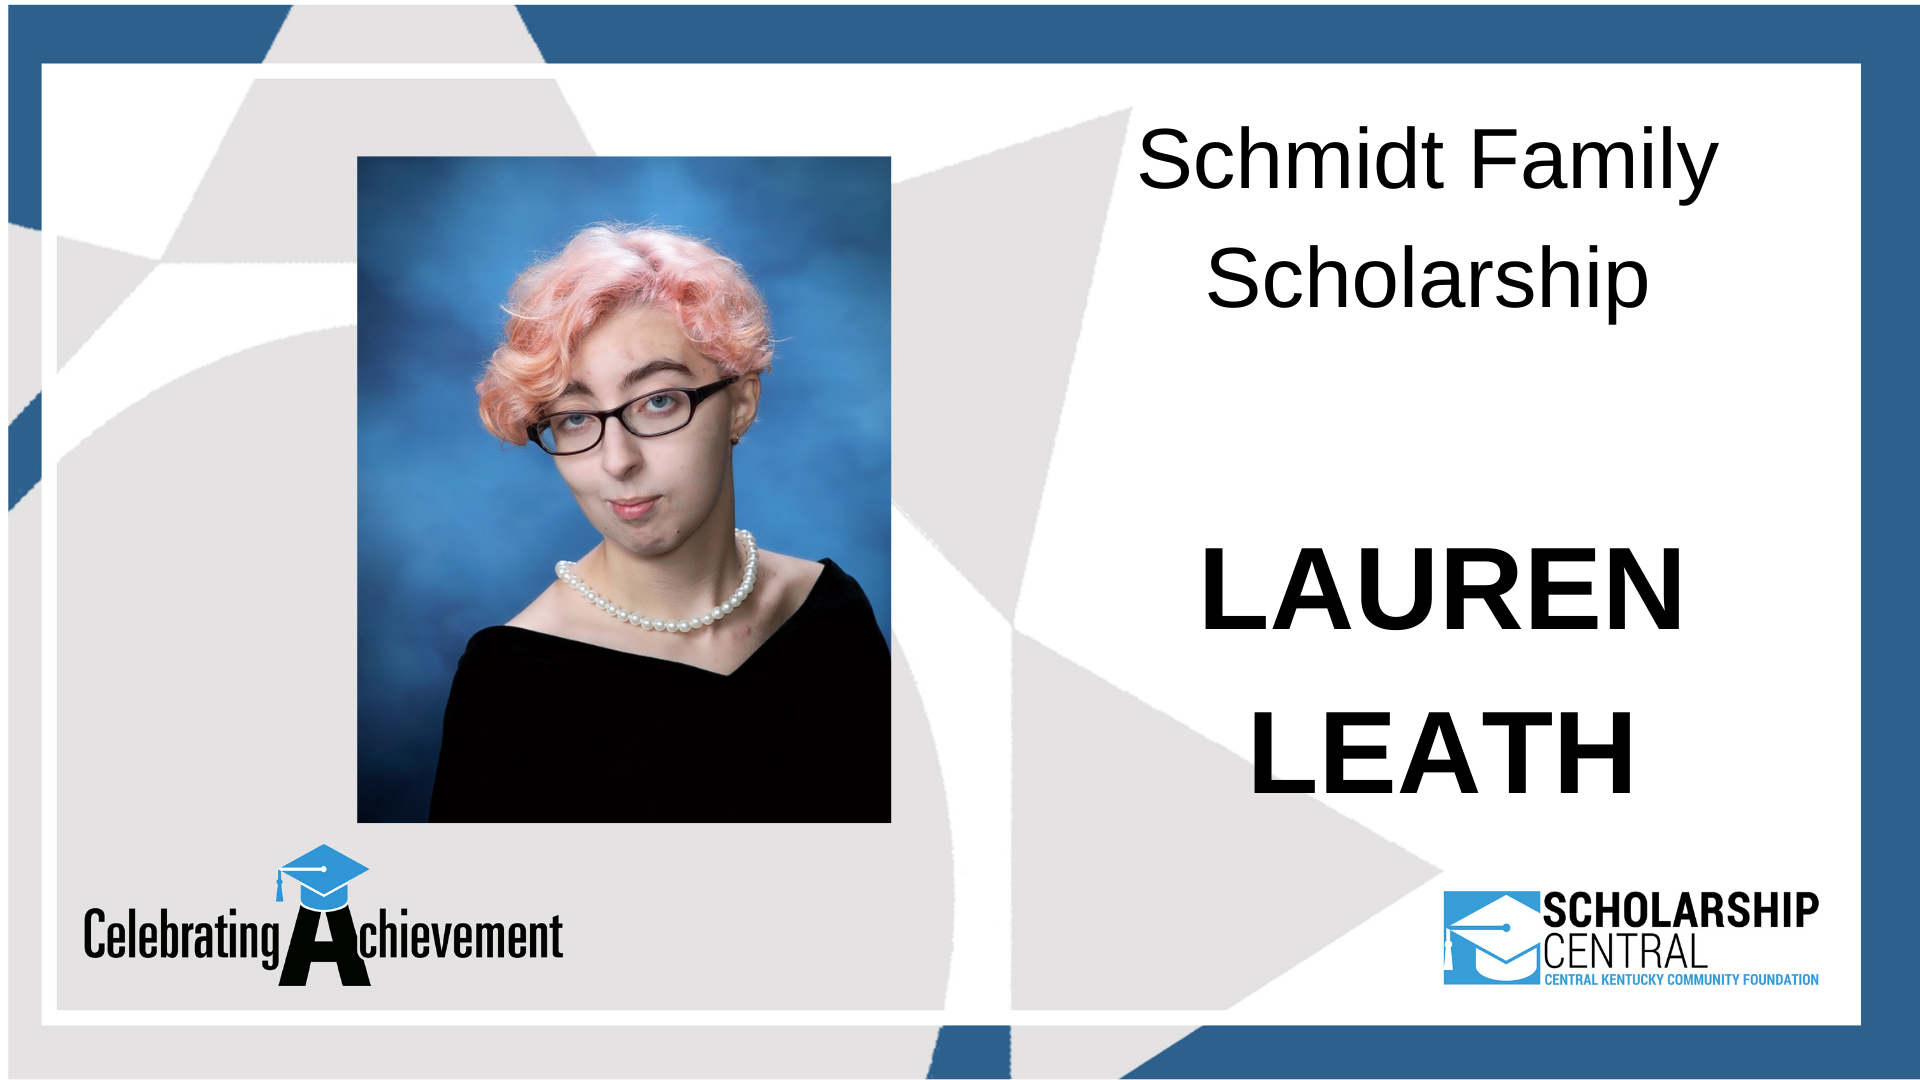 Schmidt Family Scholarship